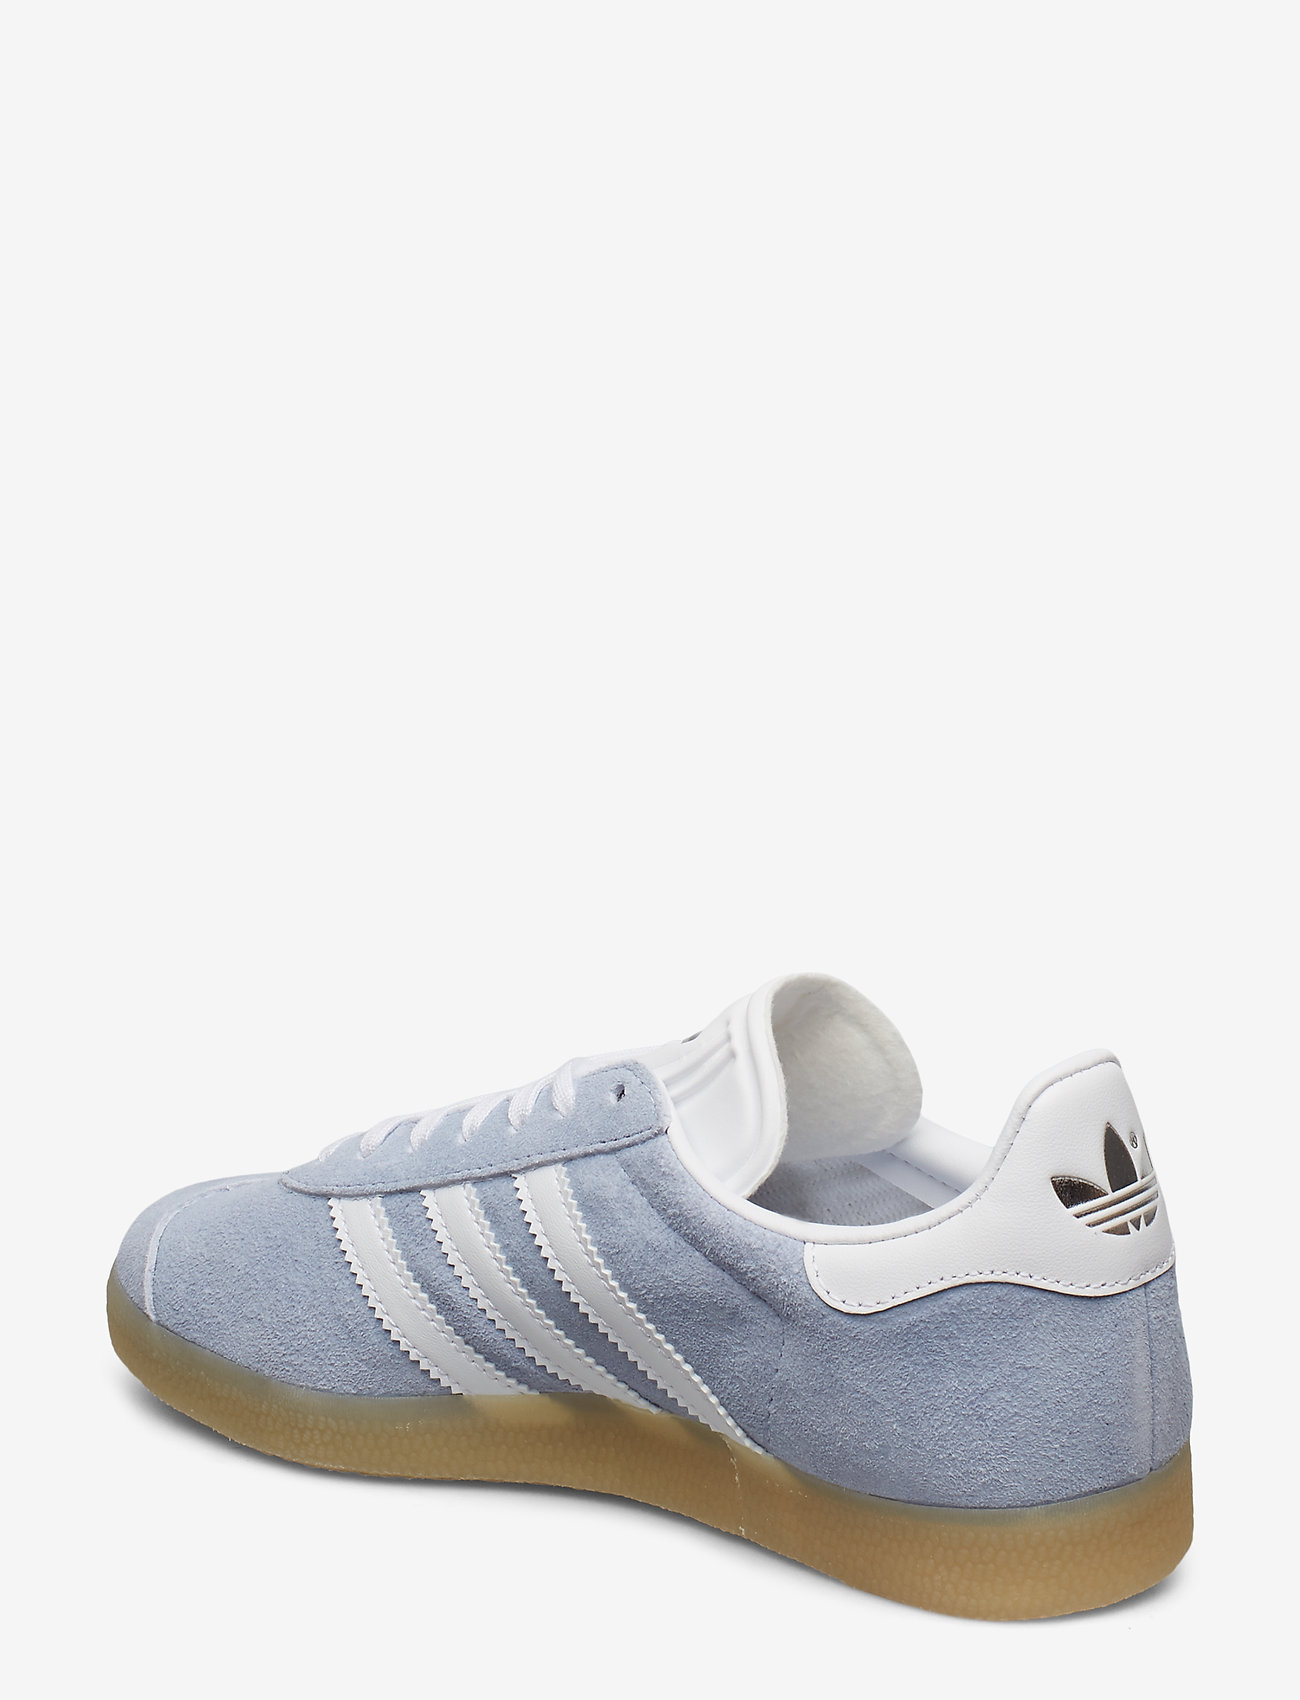 Gazelle W (Periwi/ftwwht/ecrtin) - adidas Originals